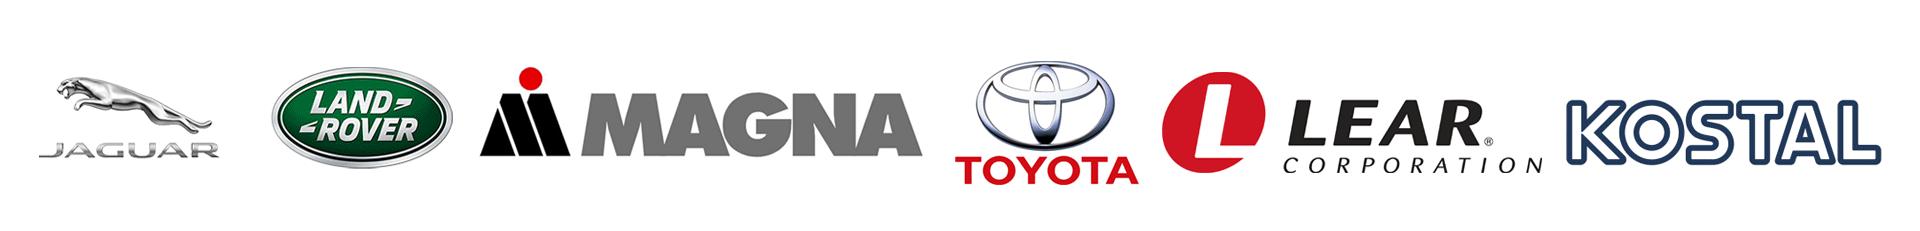 Jaguar, Land Rover, Magna, Toytoa, Lear & Kostal